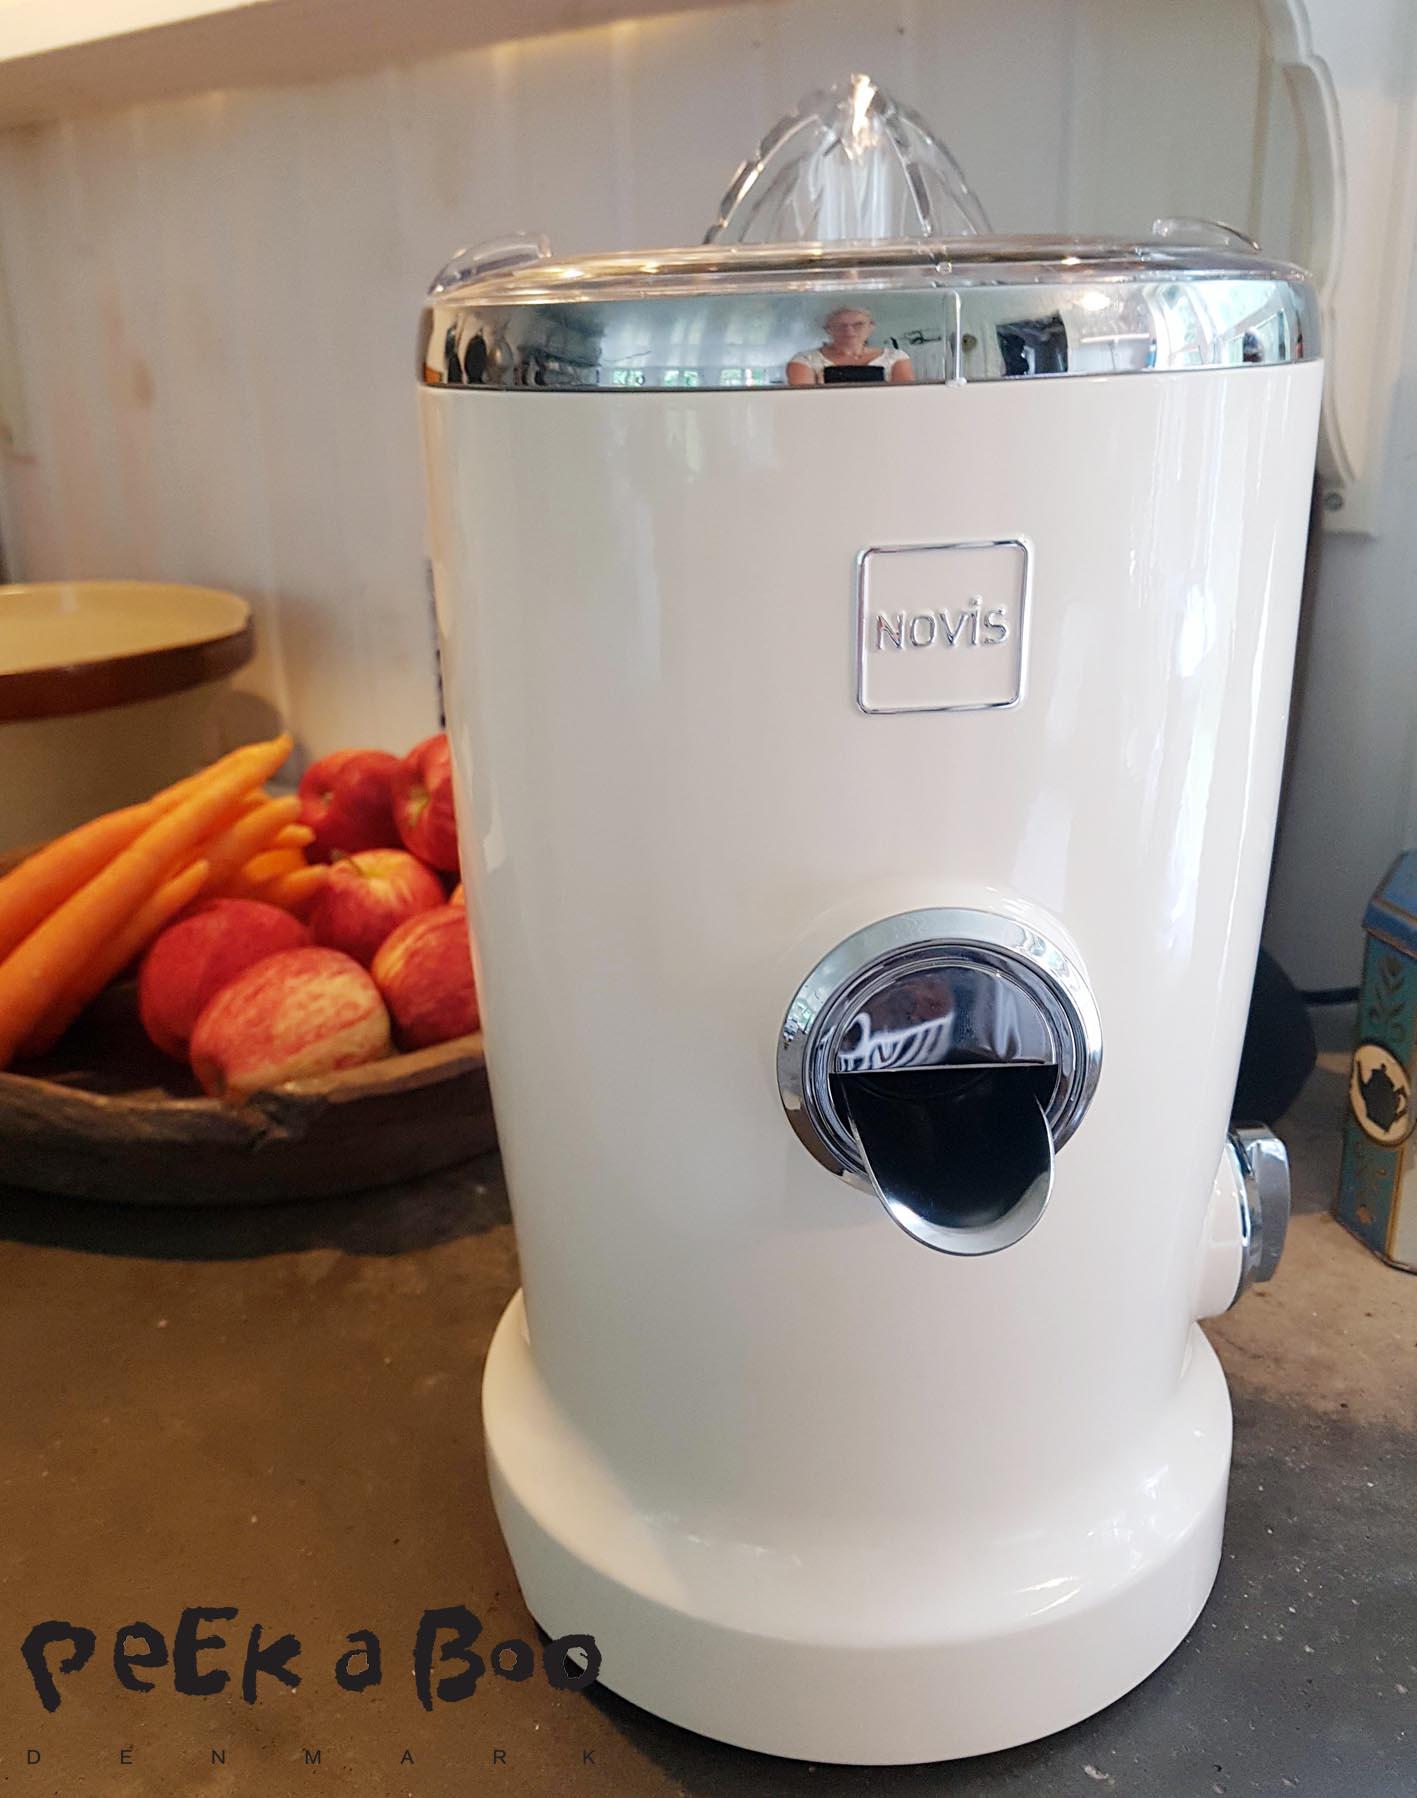 The Novis Vita Juicer won the Red Dot award 2014 for it's design.